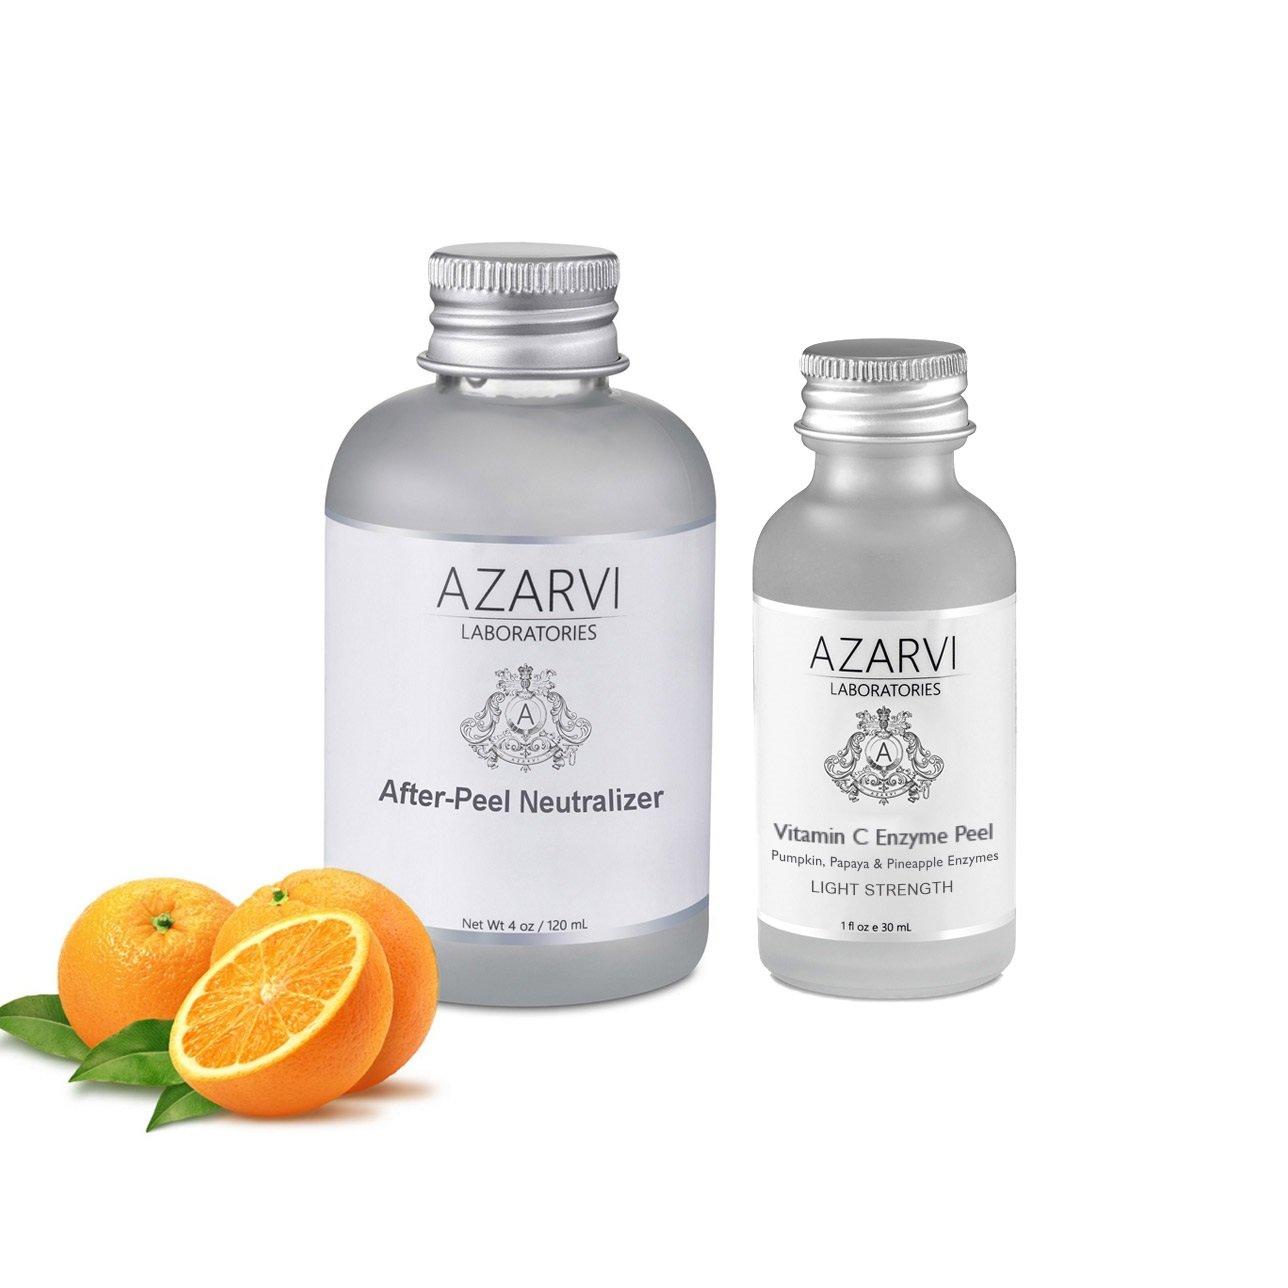 Vitamin Enzyme Peel with 40% Lactic Acid, 20% Glycolic Acid, 10% Vitamin C, Pumpkin, Papaya and Pineapple Enzymes. Get Soft, Radiant Healthy Skin. No Burning. No Peeling